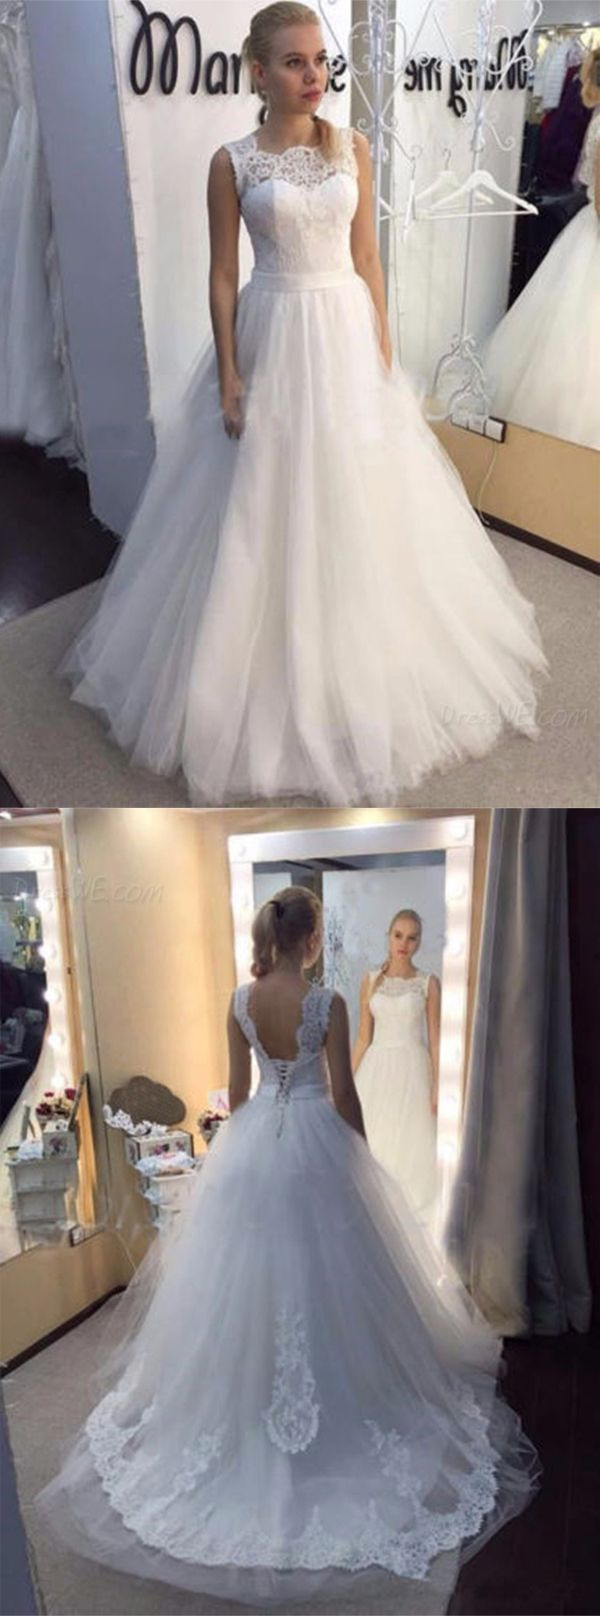 161 09 Dresswe Supplies Straps Lace Top Up Liques Wedding Dress